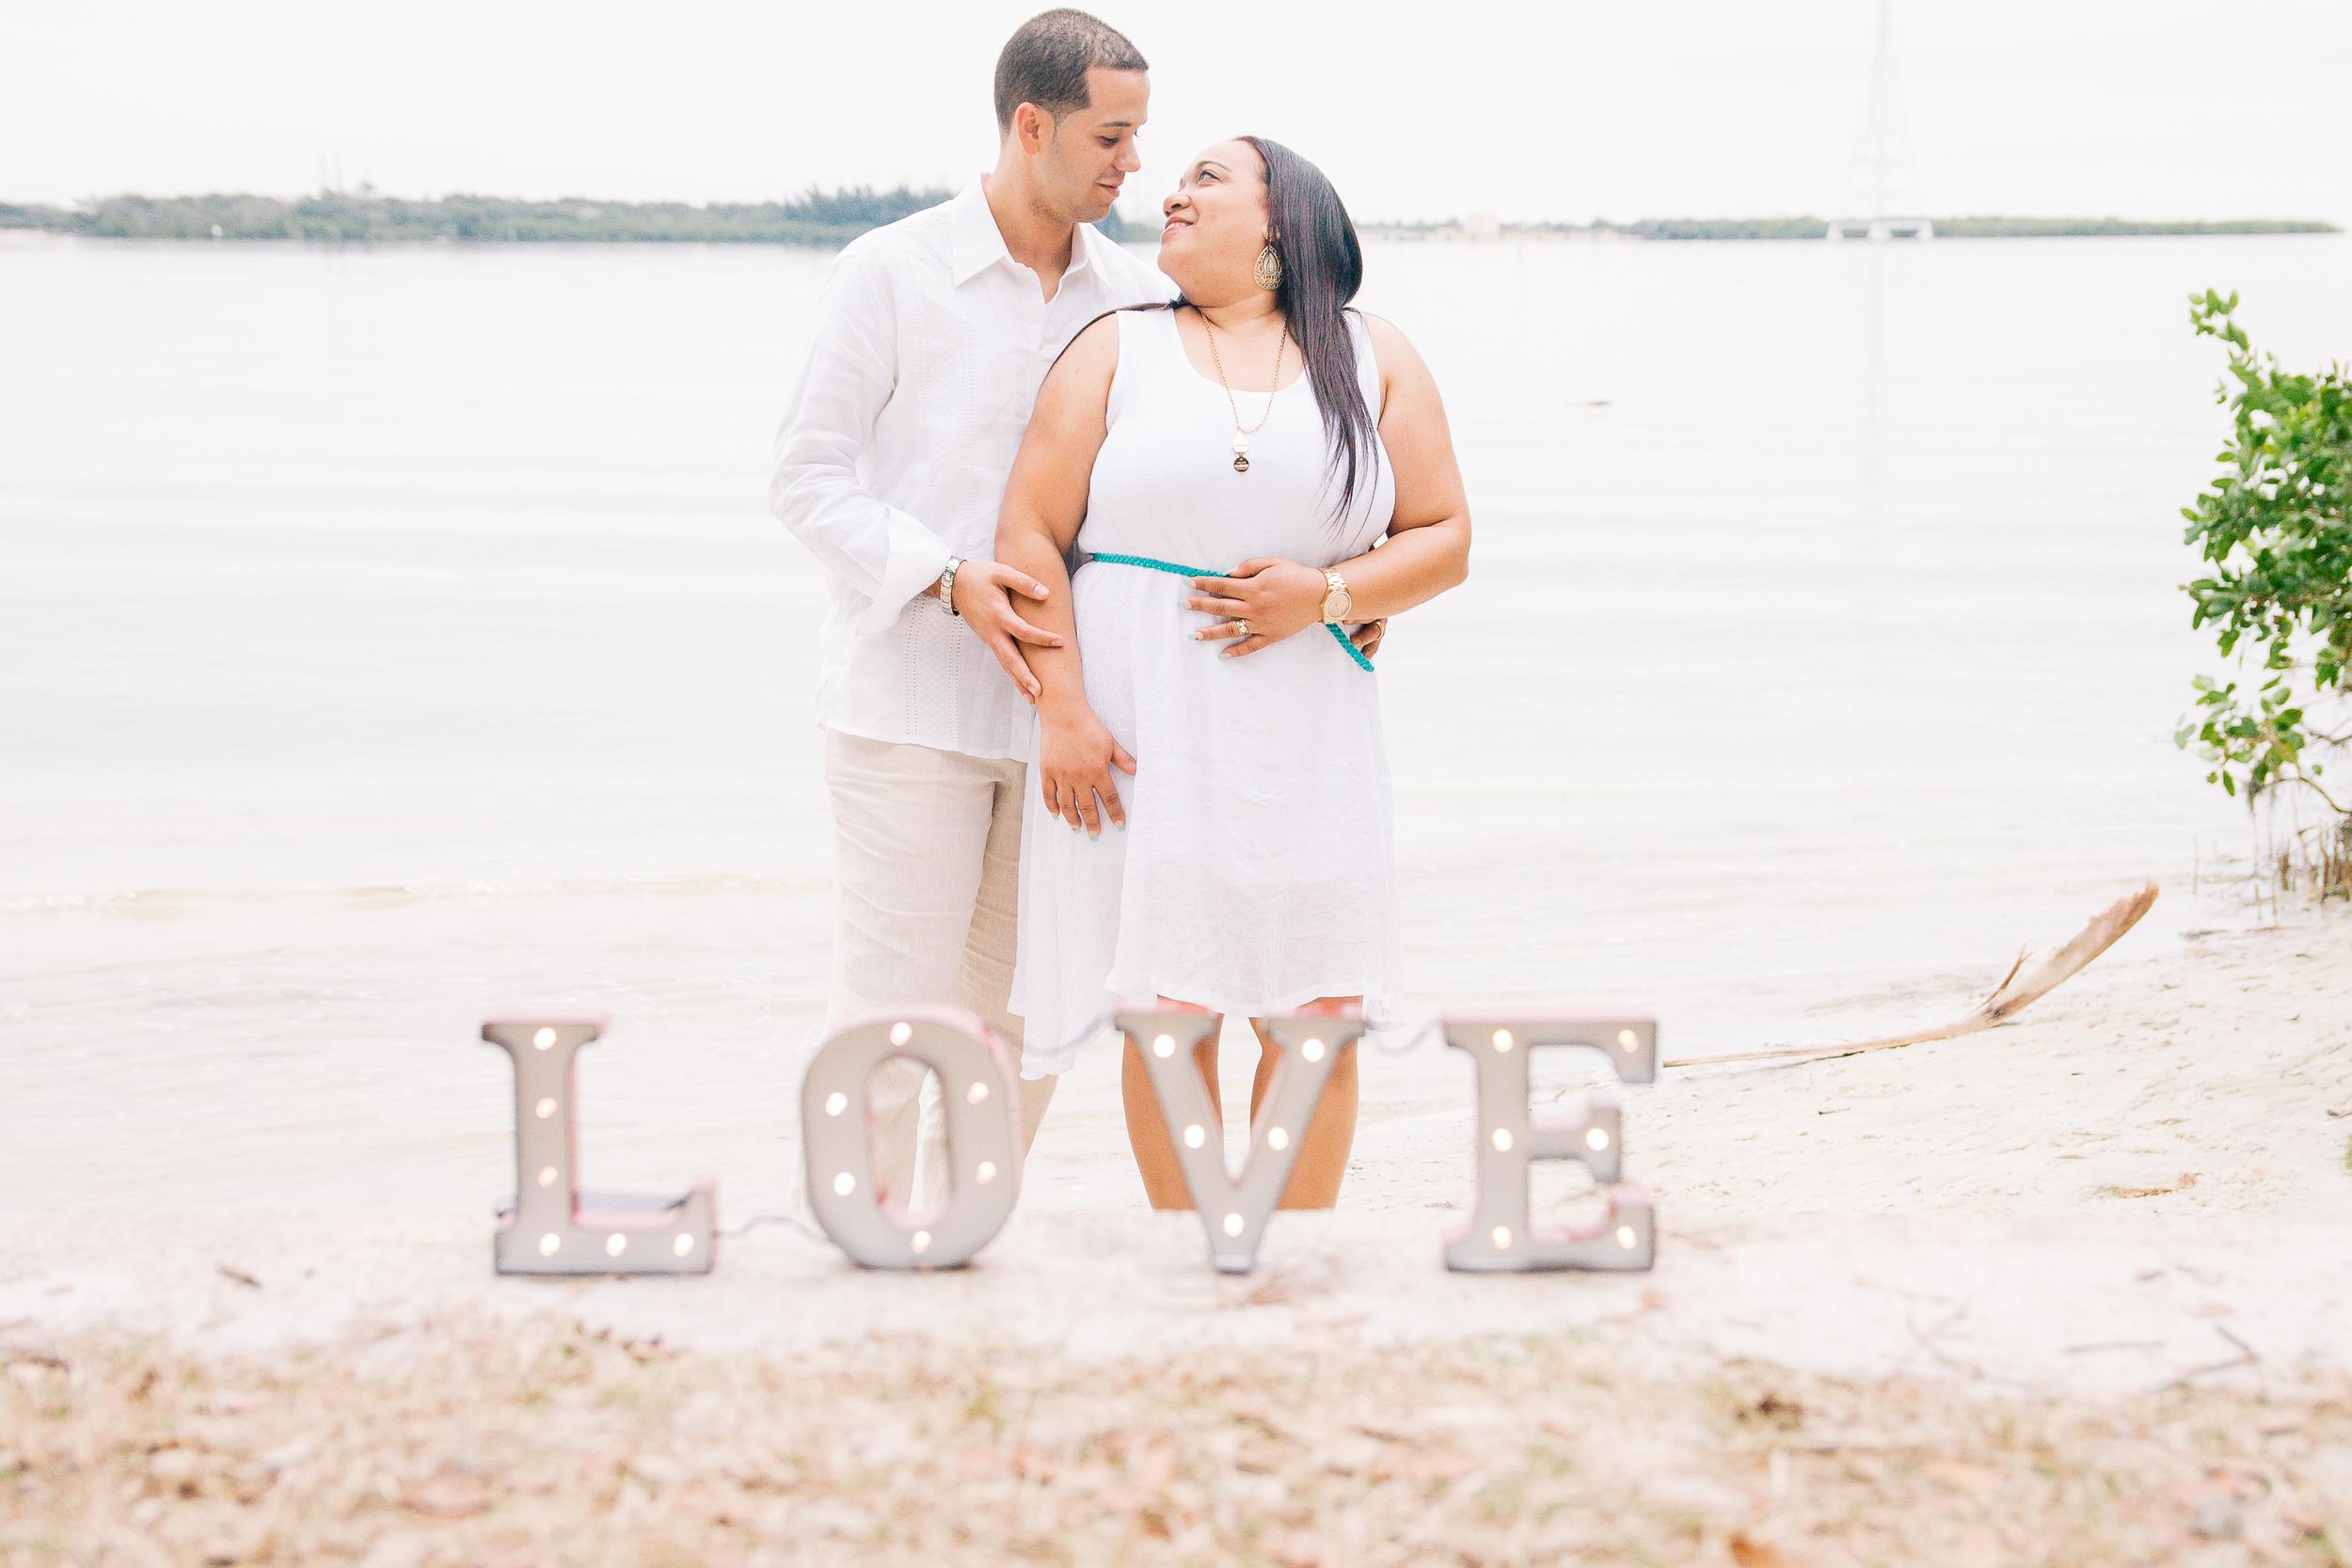 Phillipe Park wedding anniversary photo session